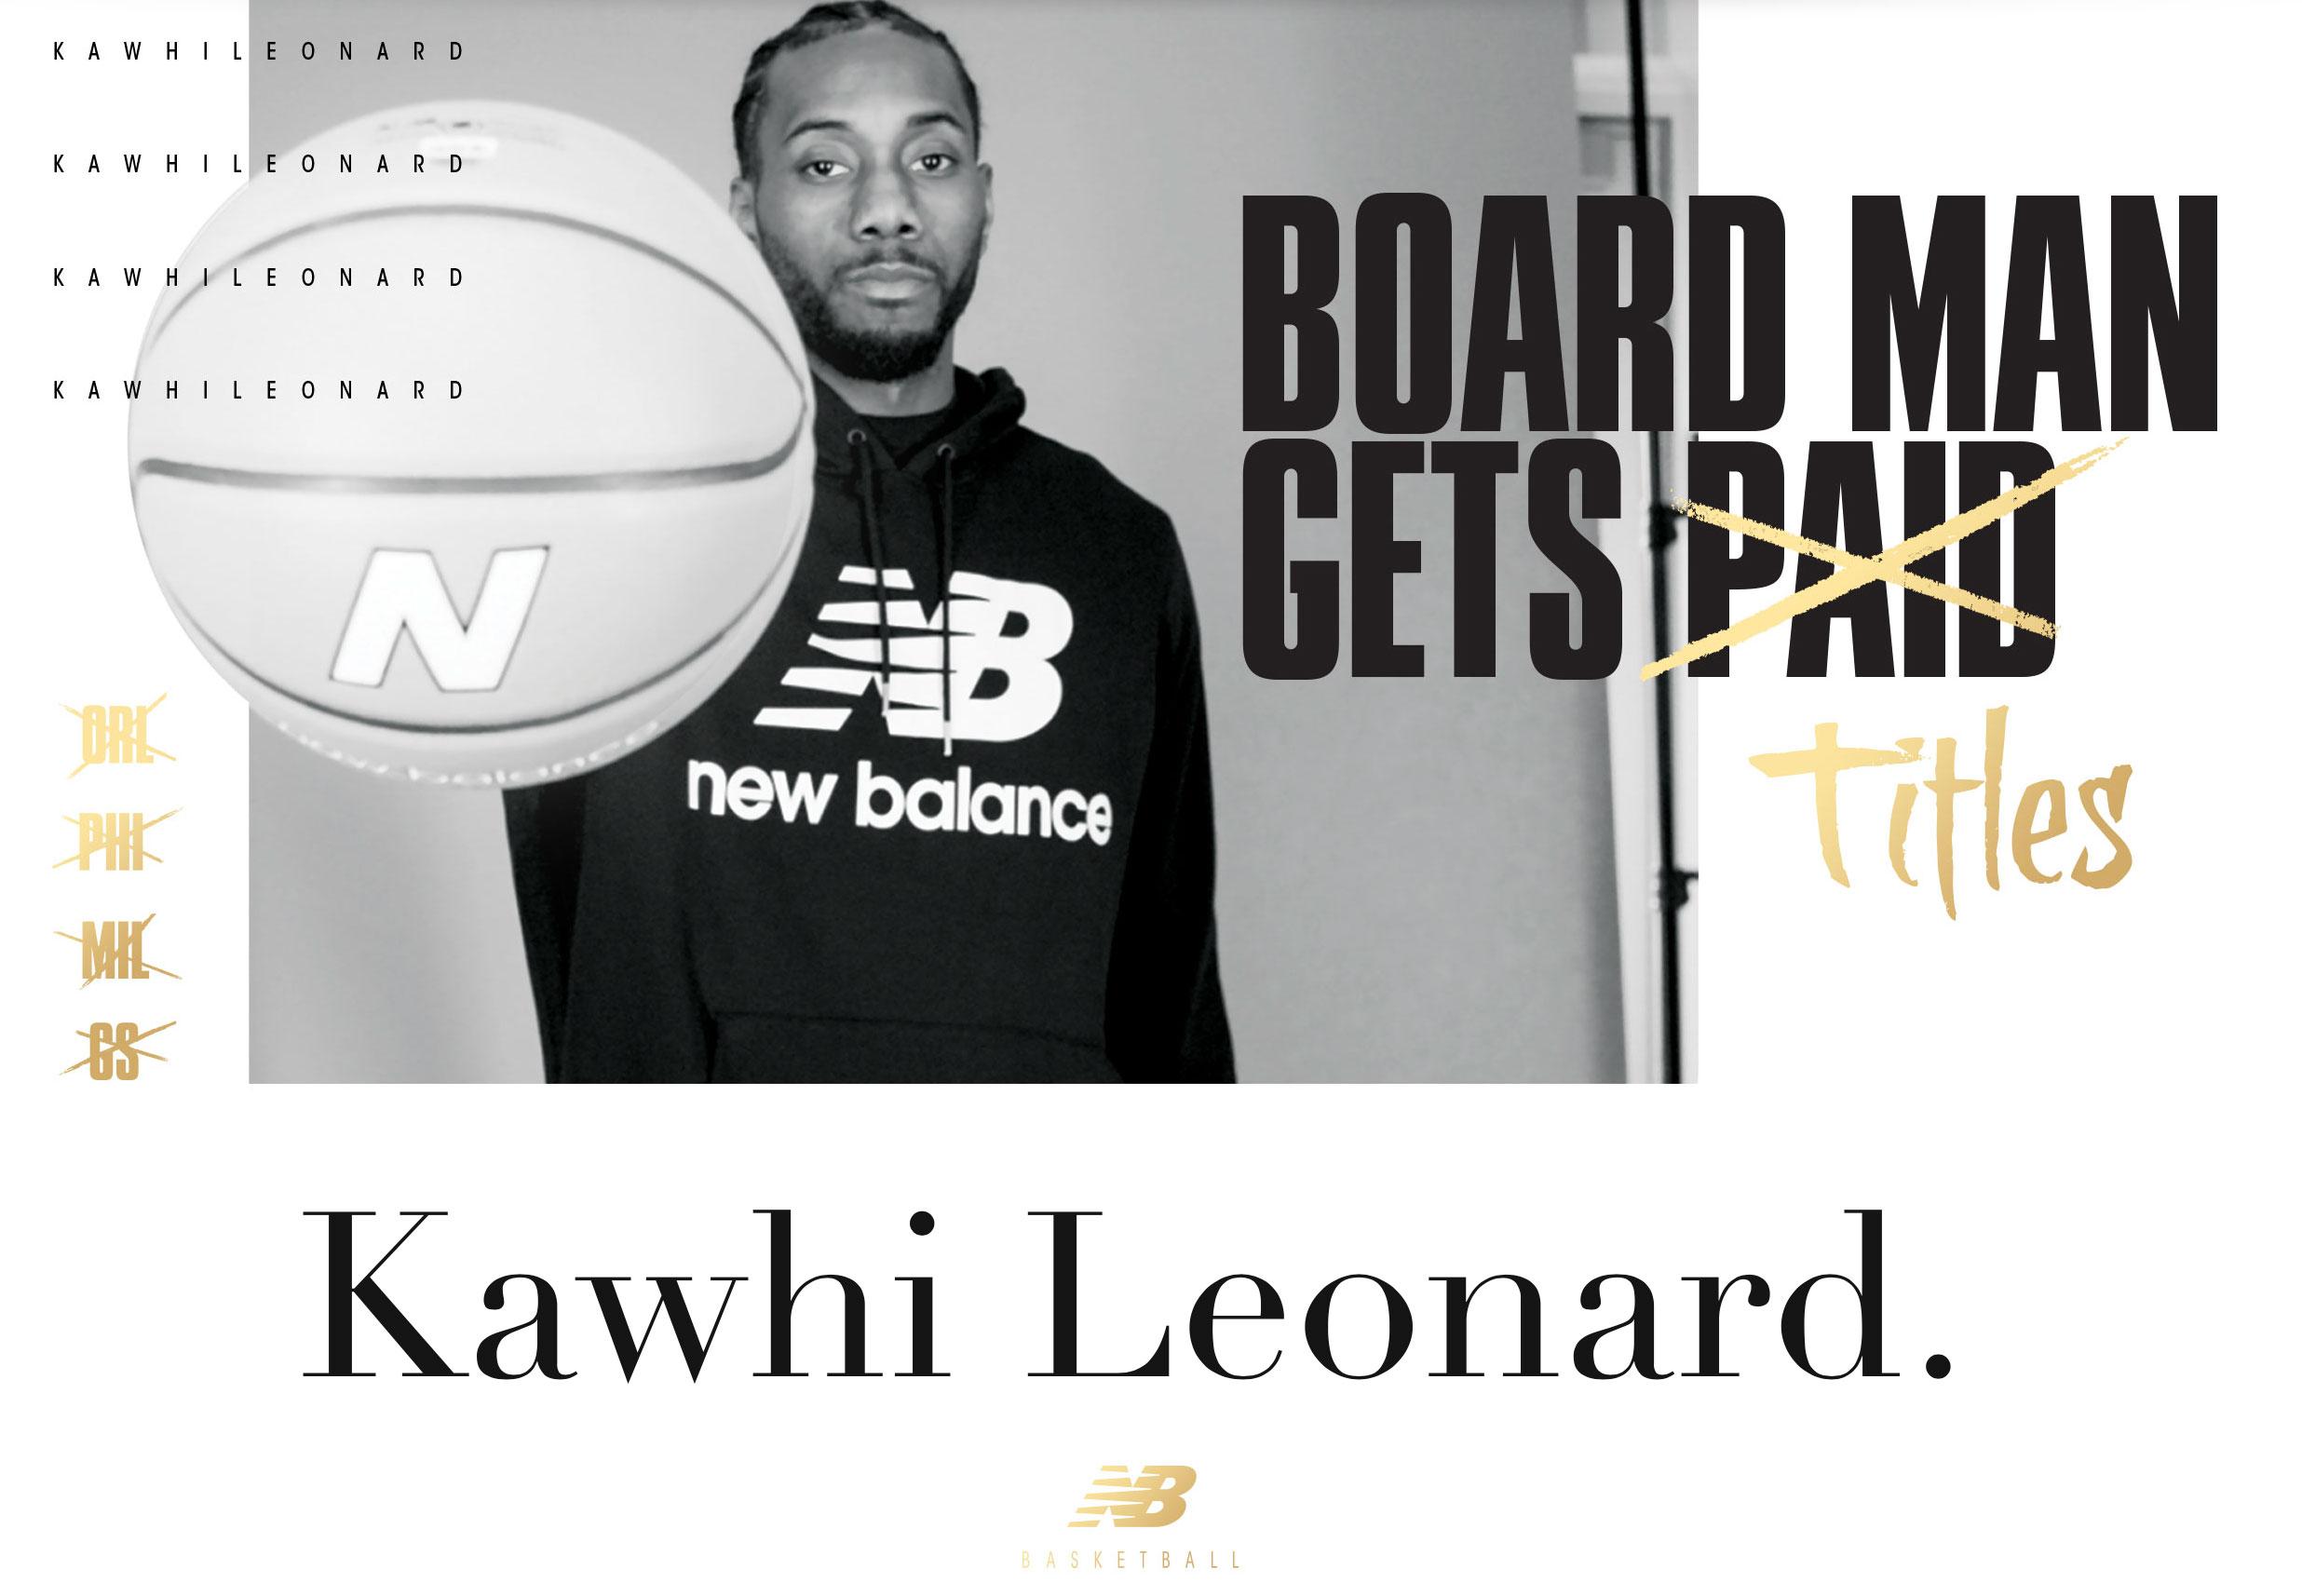 Kawhi Leonard New Balance Shirts and